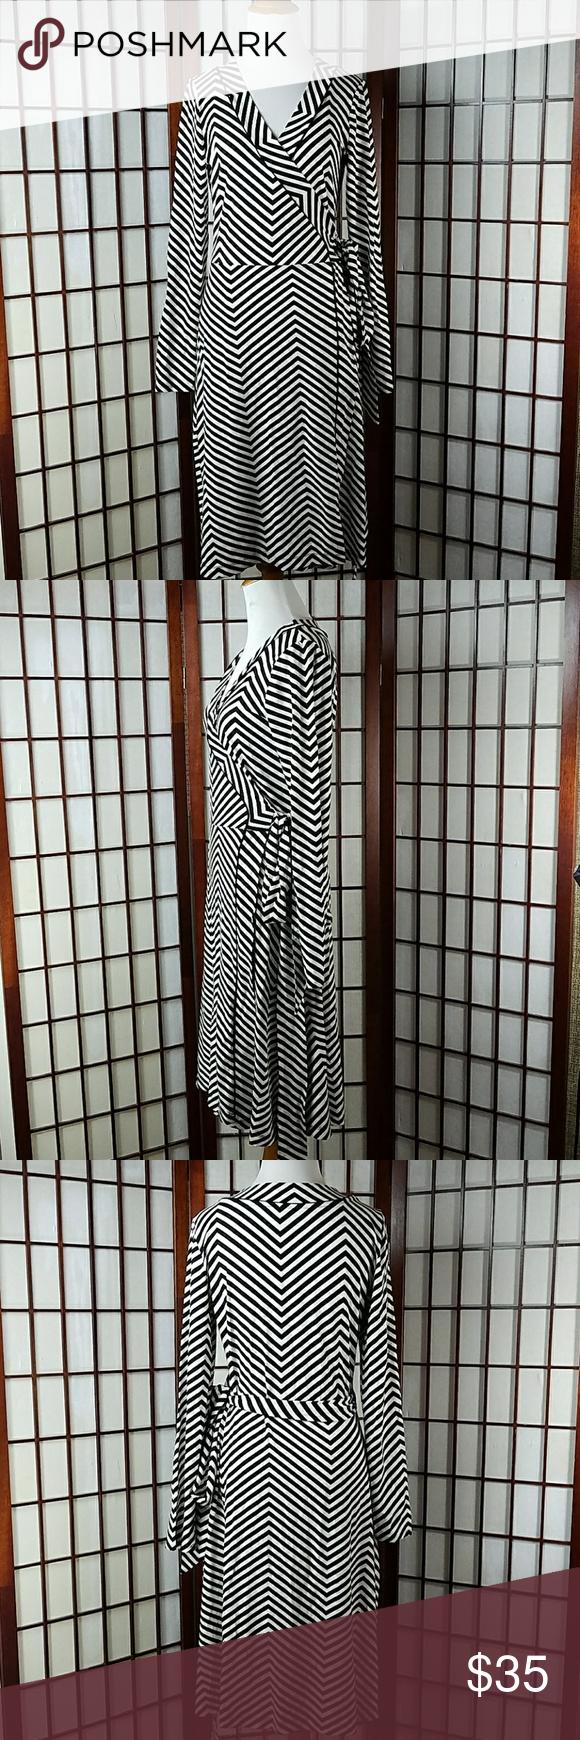 Banana republic striped long sleeve wrap dress wrap dresses